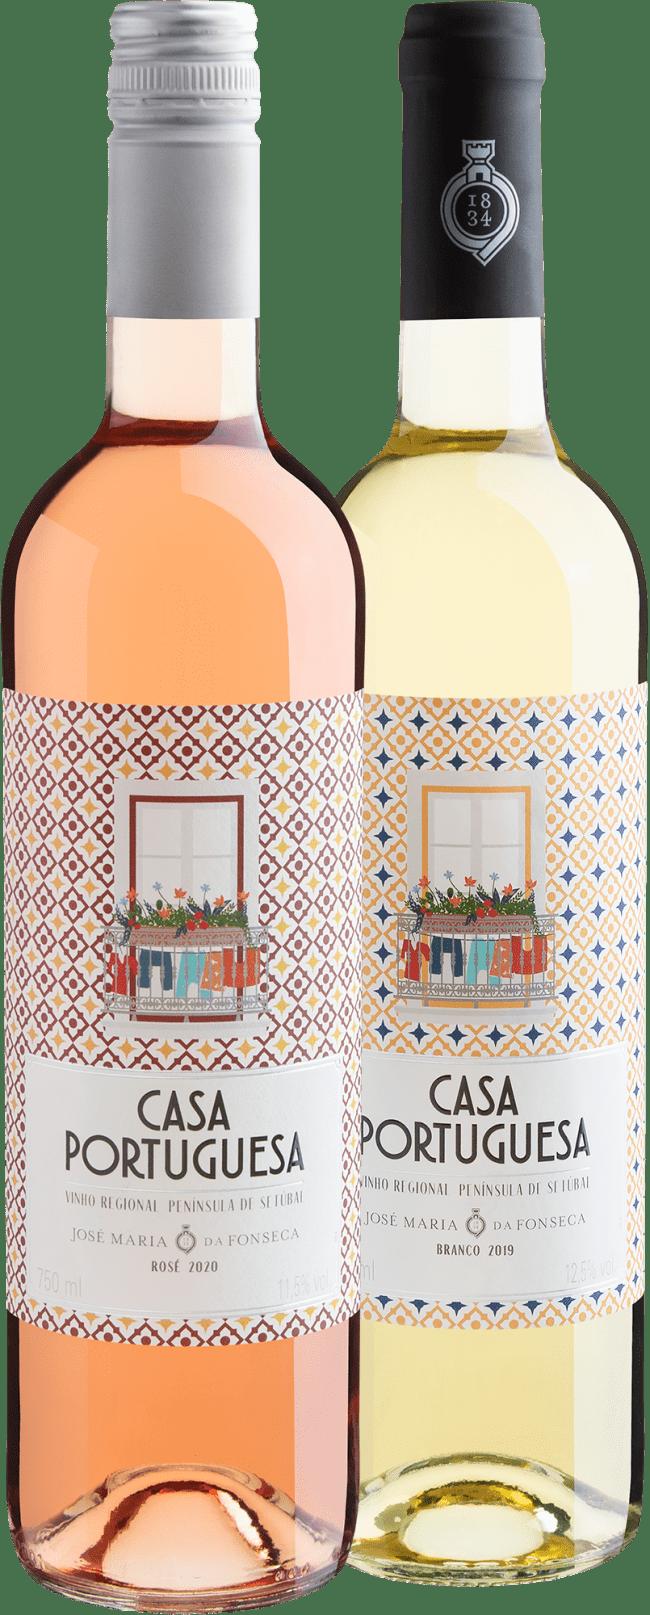 Duo Casa Portuguesa Fresh - Portugal